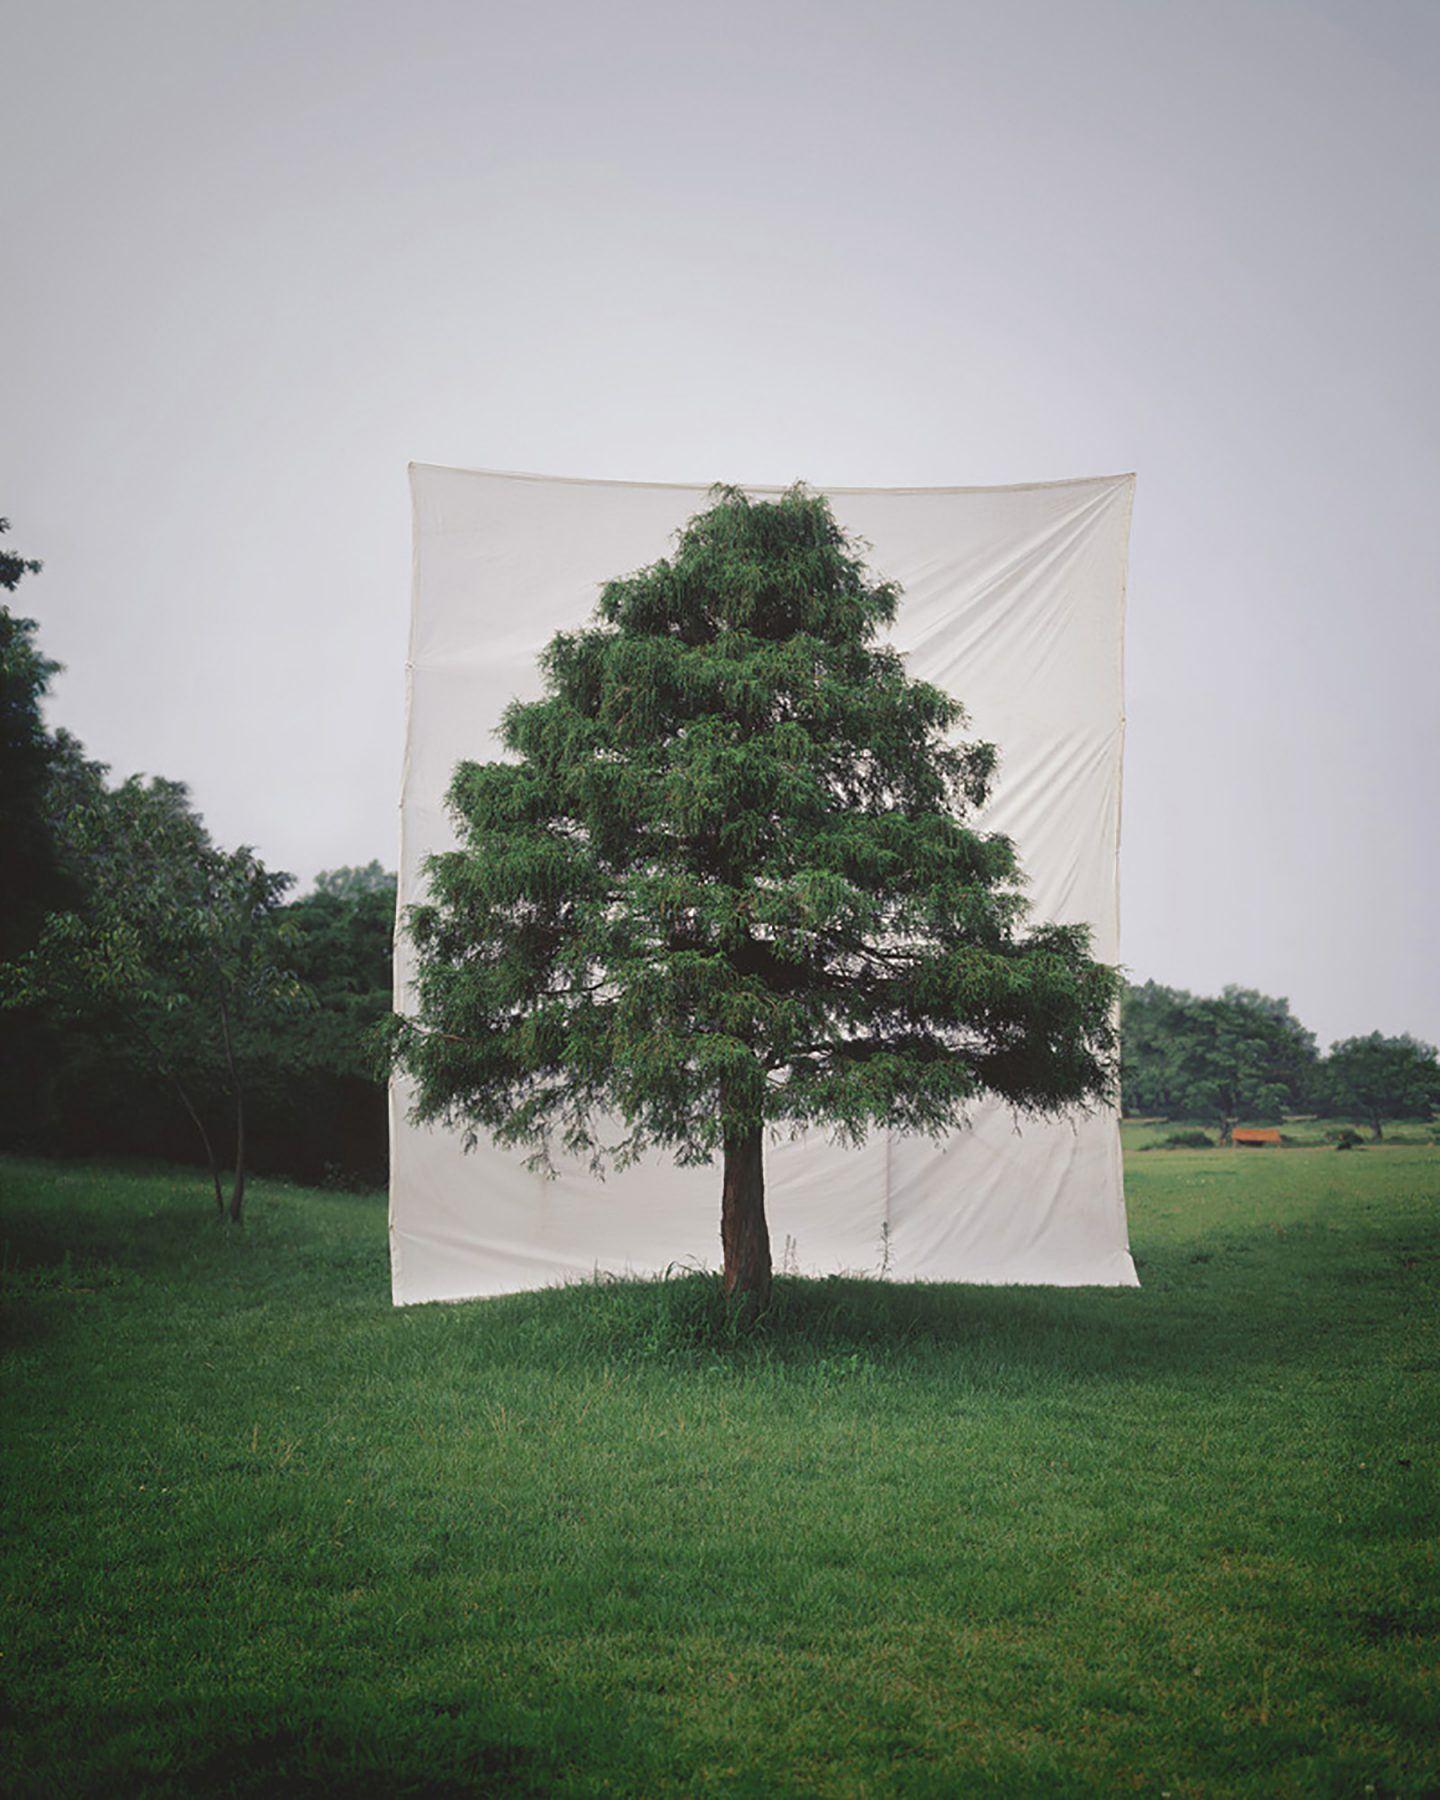 IGNANT-Art-Myoung-Ho-Lee-Tree-13